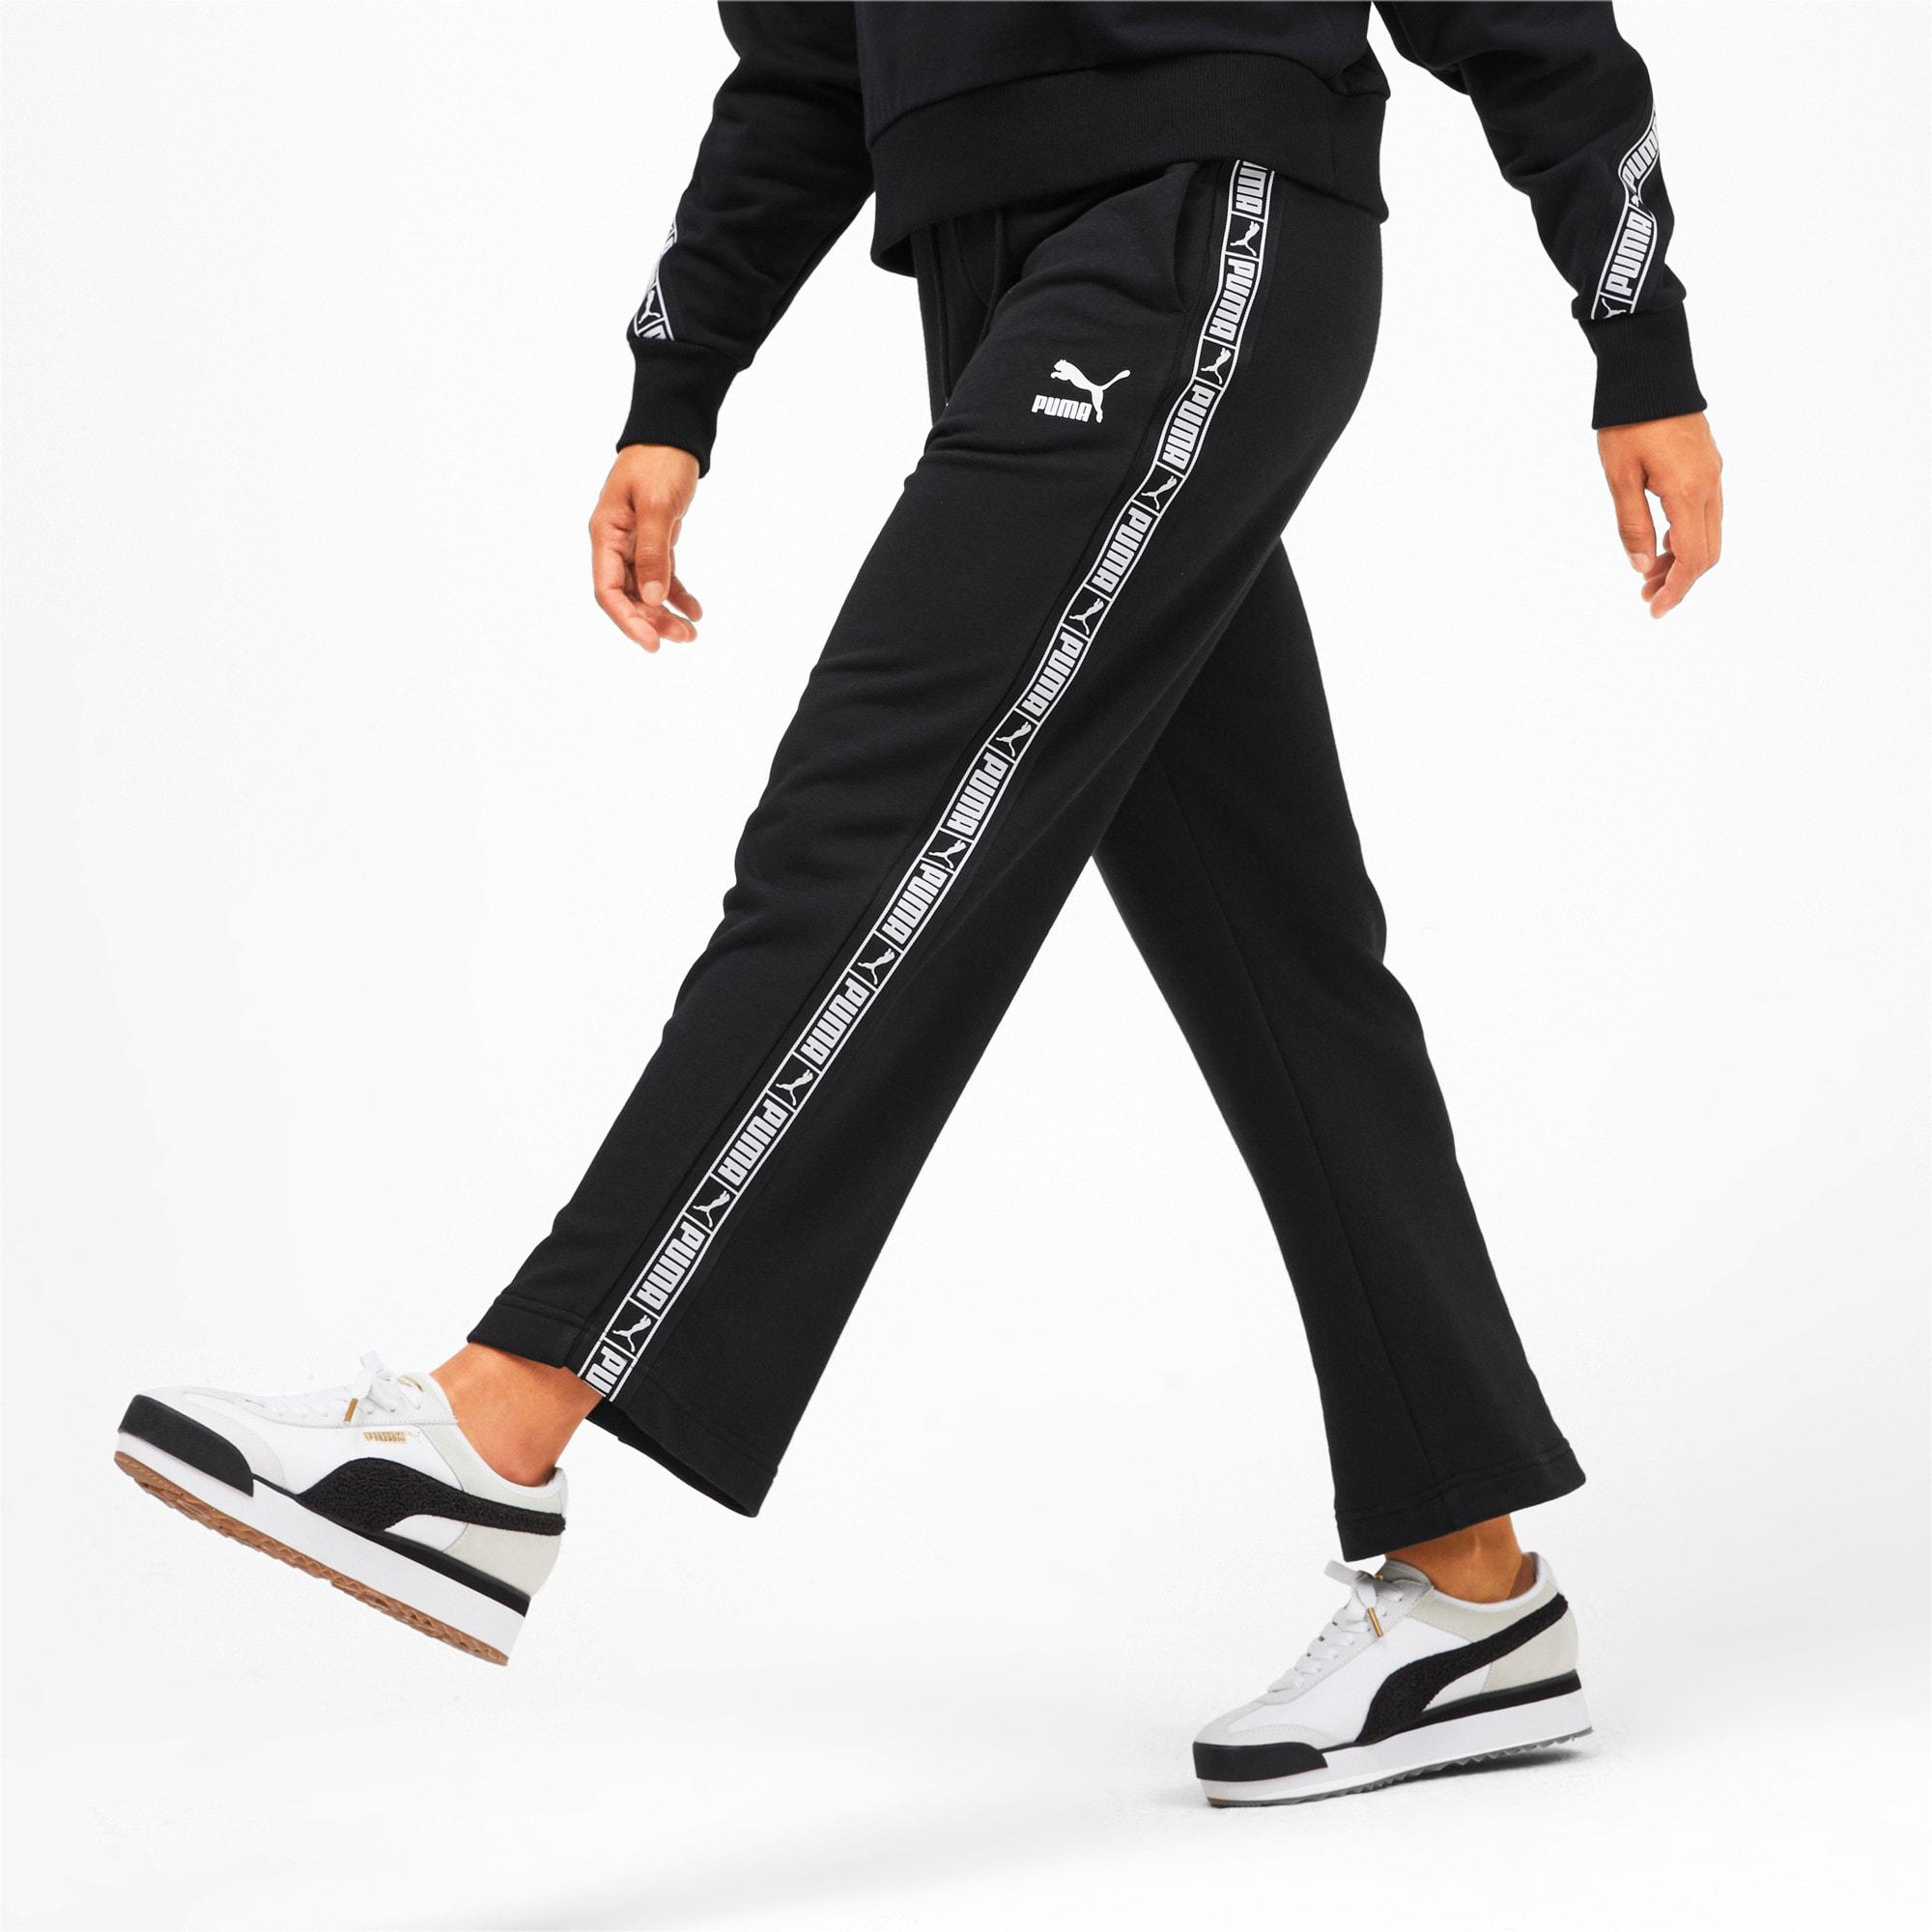 Thumbnail 2 of Classics Women's Track Pants, Puma Black, medium